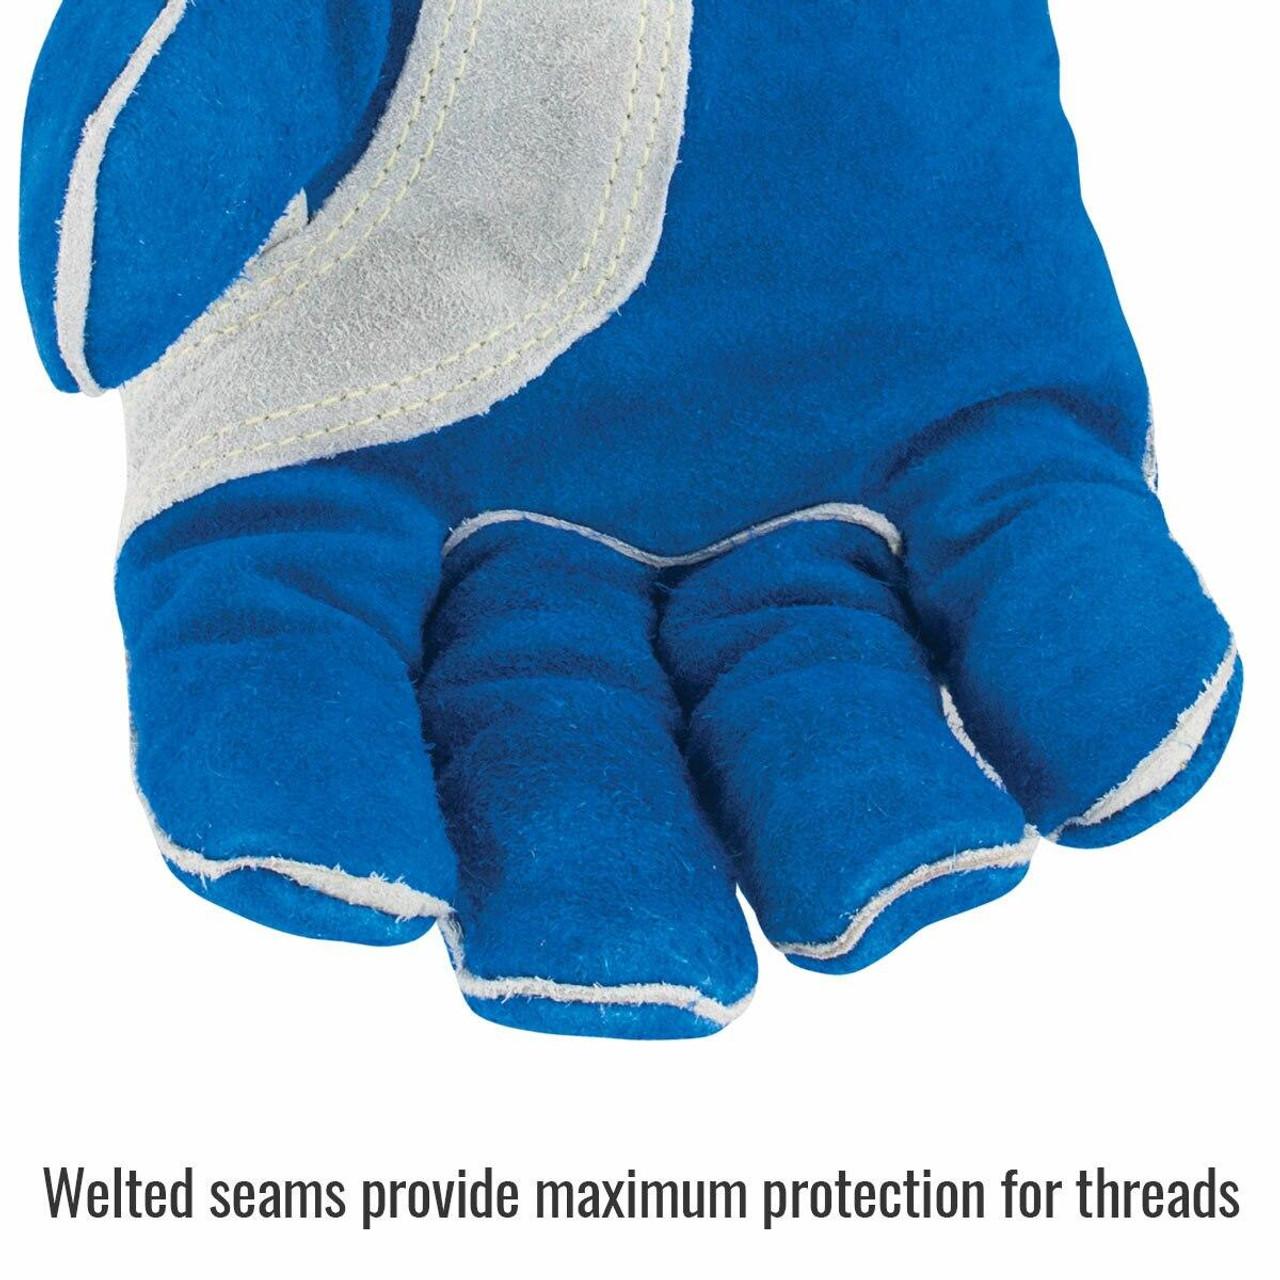 Revco Black Stallion CushionCore Quality Side Split Cowhide Stick Welding Gloves